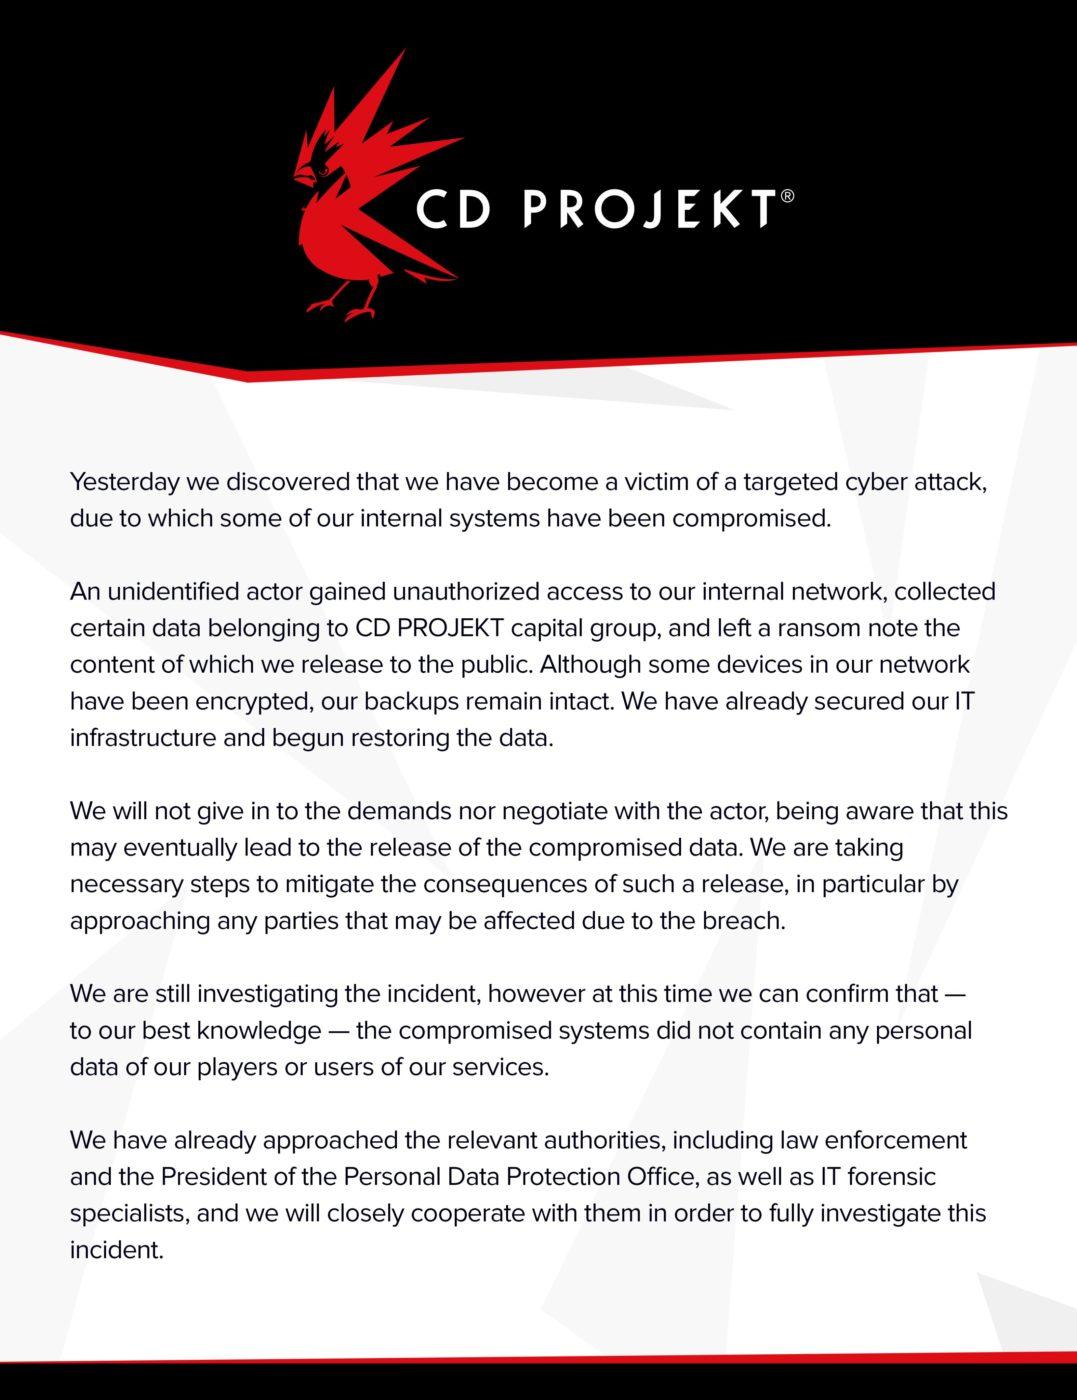 CD Projekt RED Hacked, Ransom Demanded - MP1st